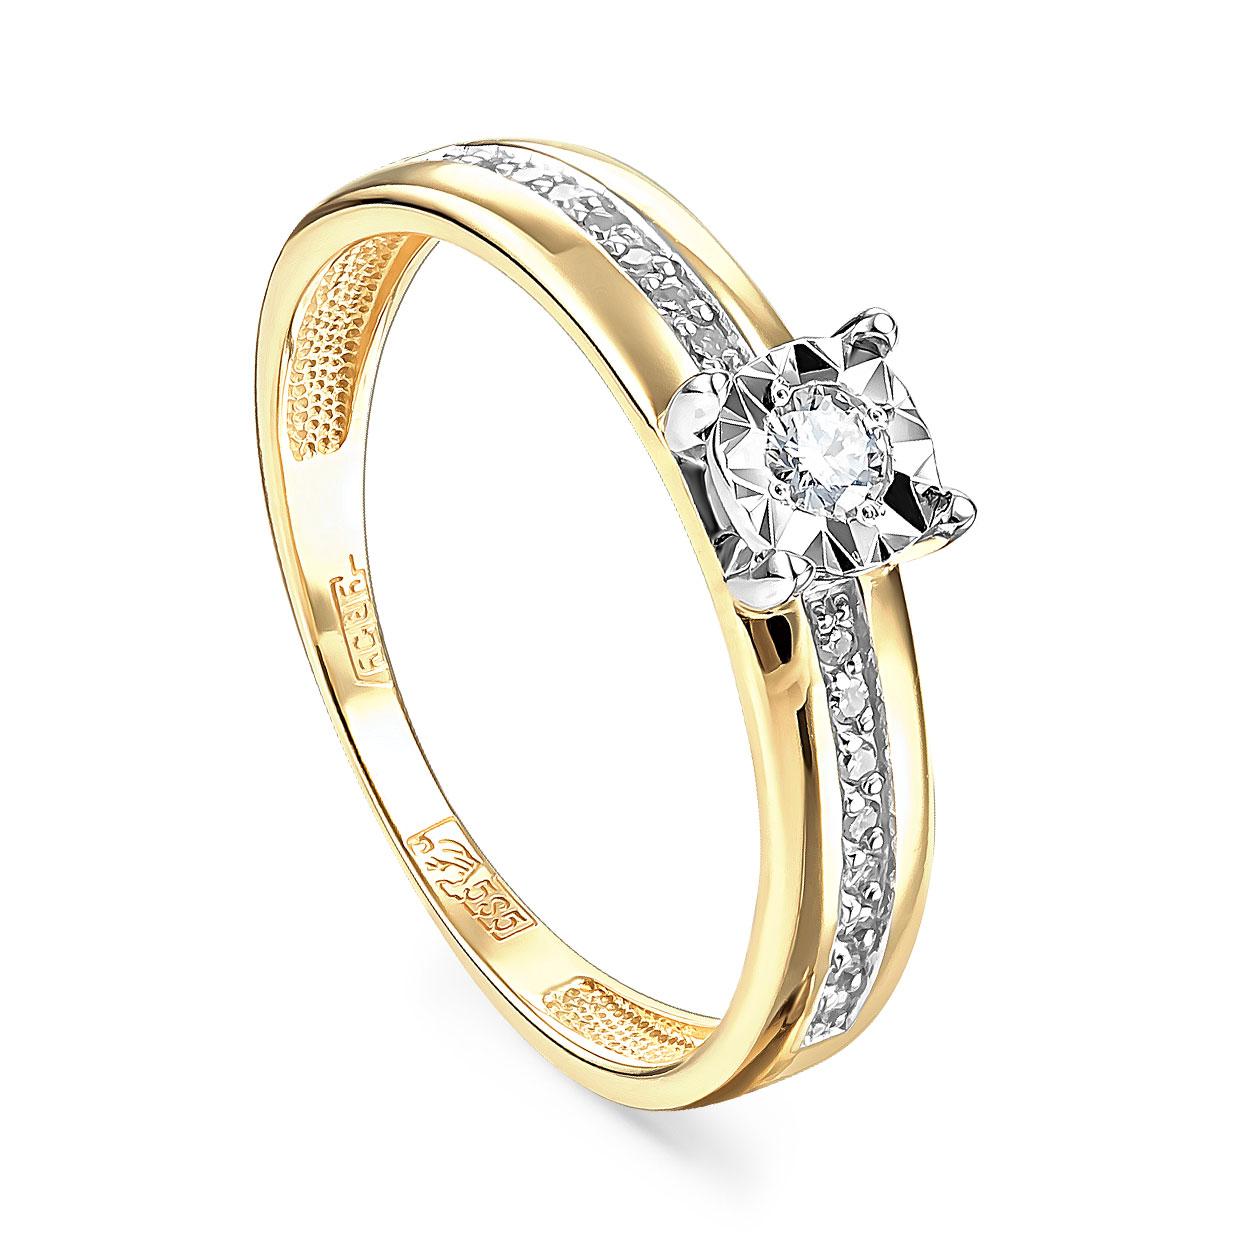 Кольцо из лимонного золота Бриллиант арт. 11-21086-1000 11-21086-1000